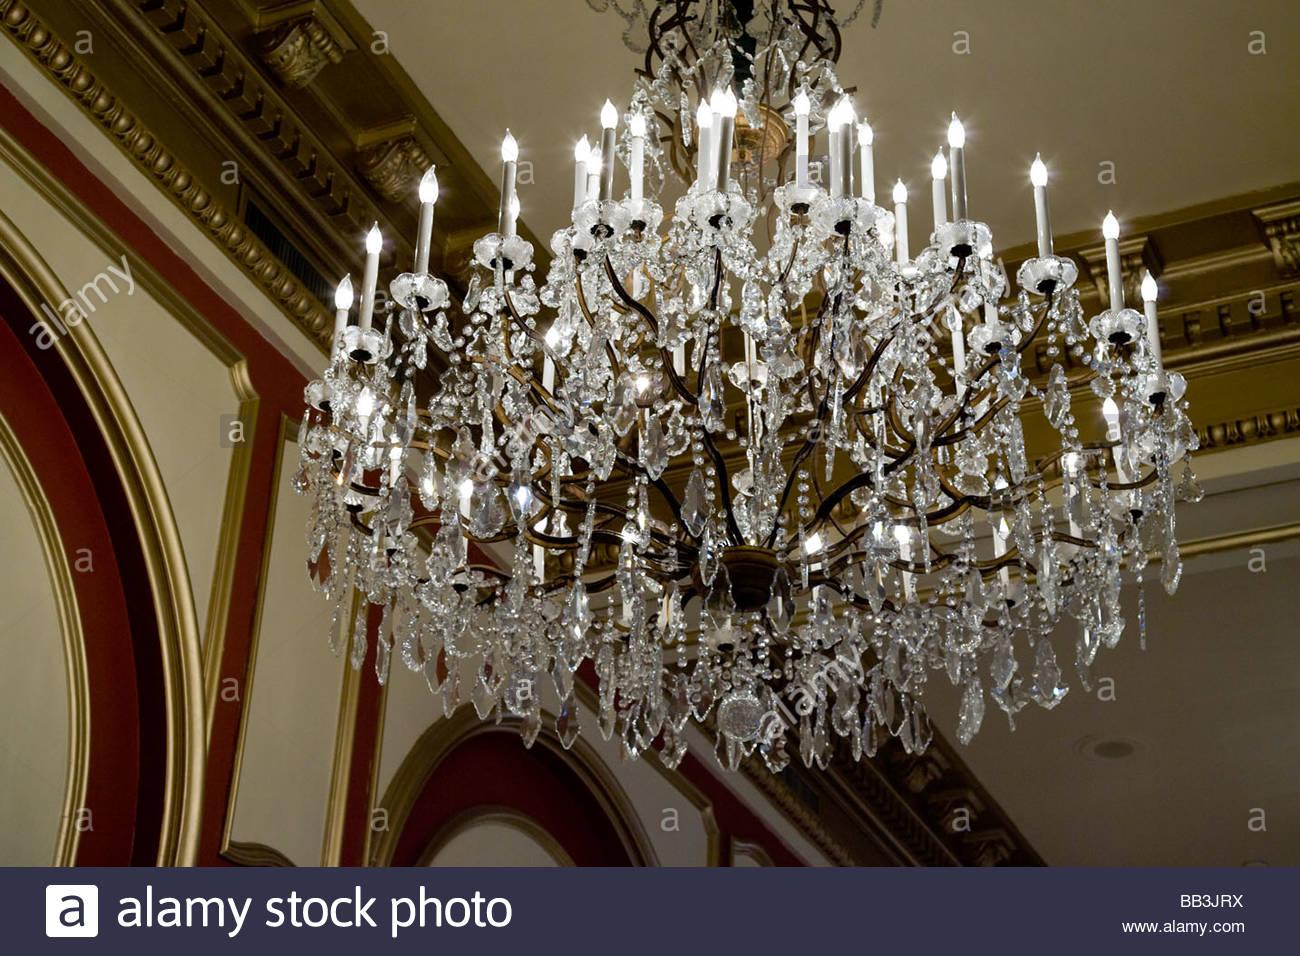 Ornate chandelier stock photos ornate chandelier stock images alamy an ornate chandelier in the lobby of le pavillon aloadofball Gallery